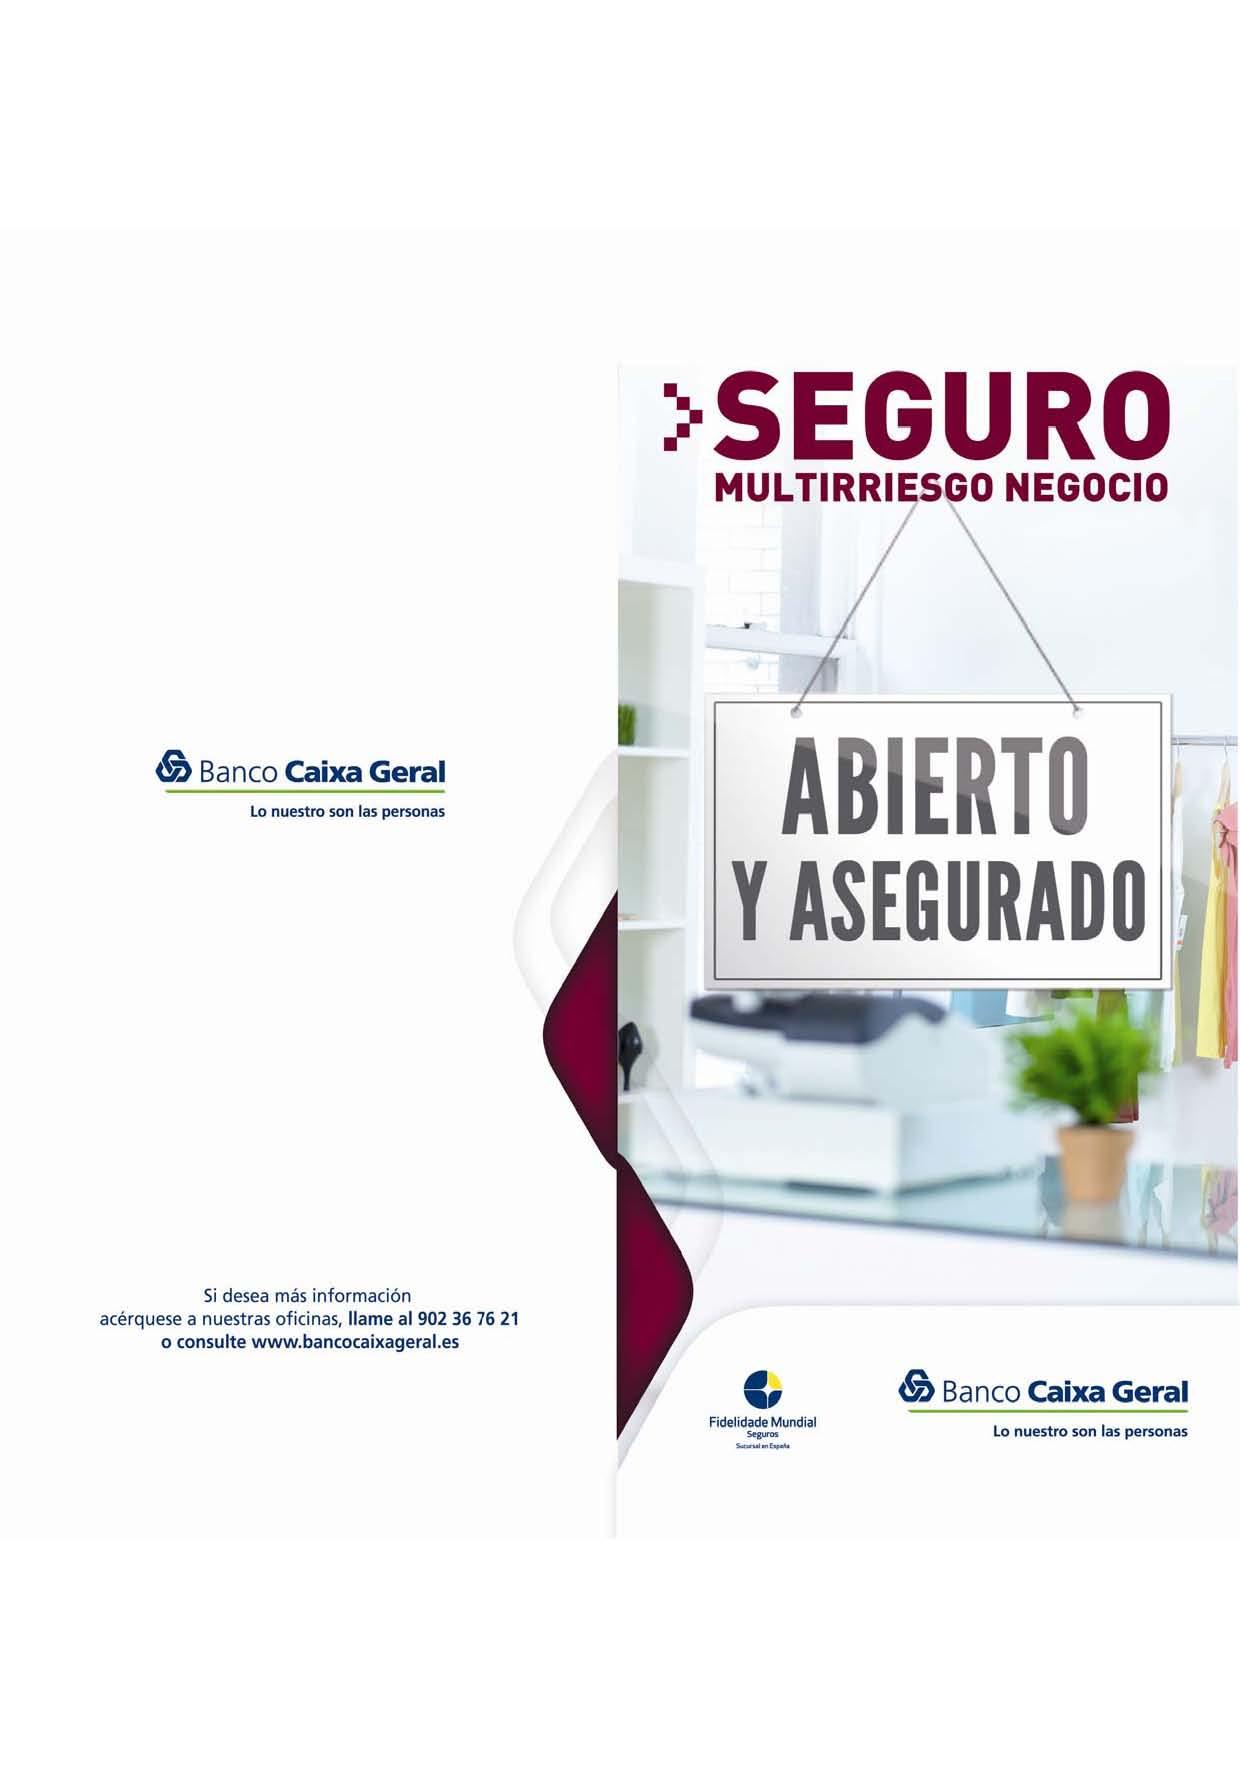 Oferta de seguros del banco caixa geral para asociados de for Seguro hogar la caixa